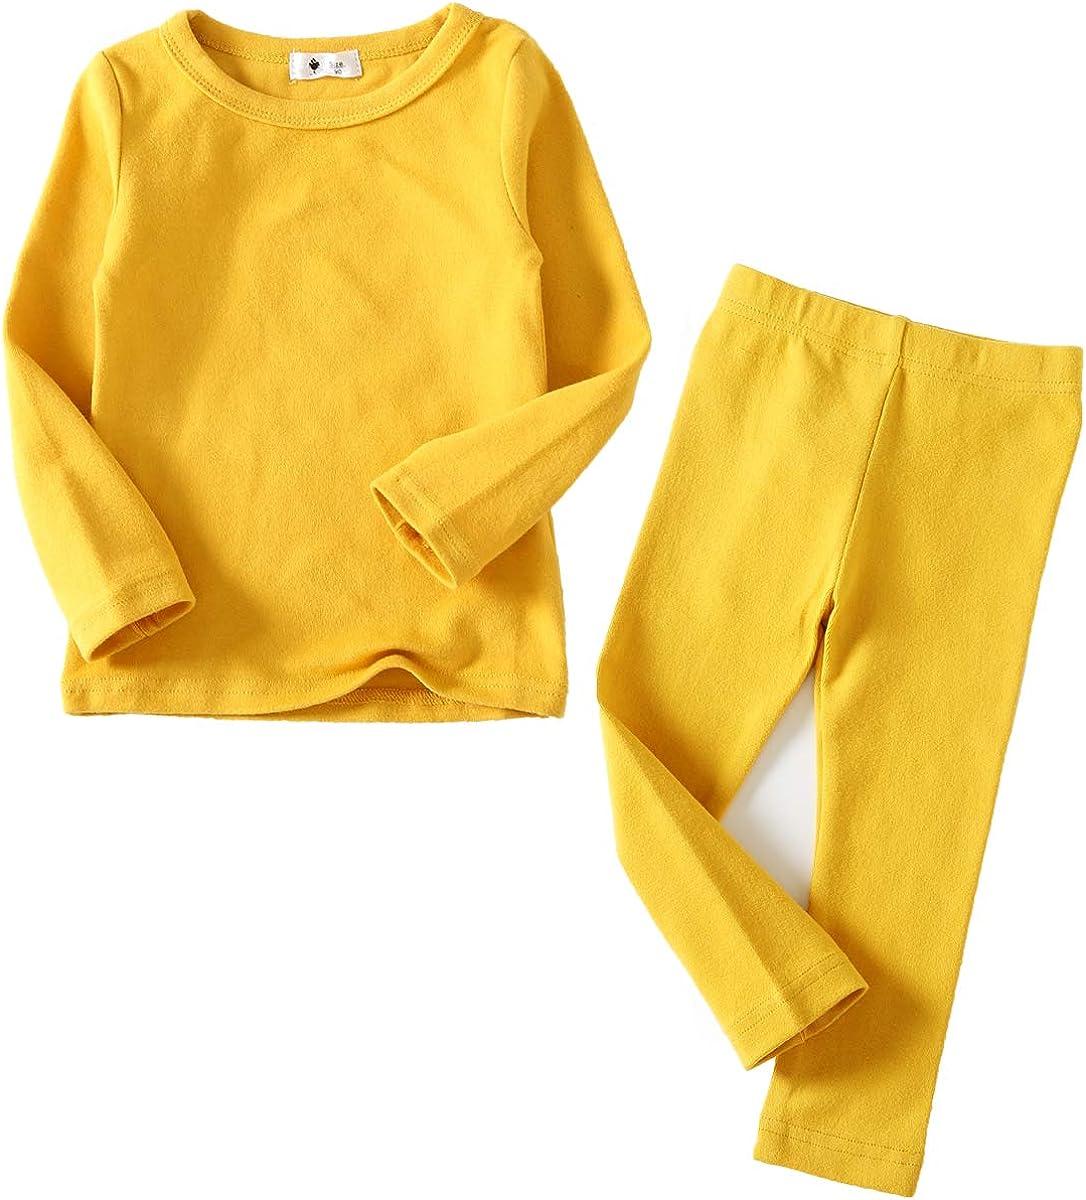 Toddler Girls Boys Pajamas Basic Solid Color Cotton Sleepwear Soft Long Sleeve Pjs 2pcs Set